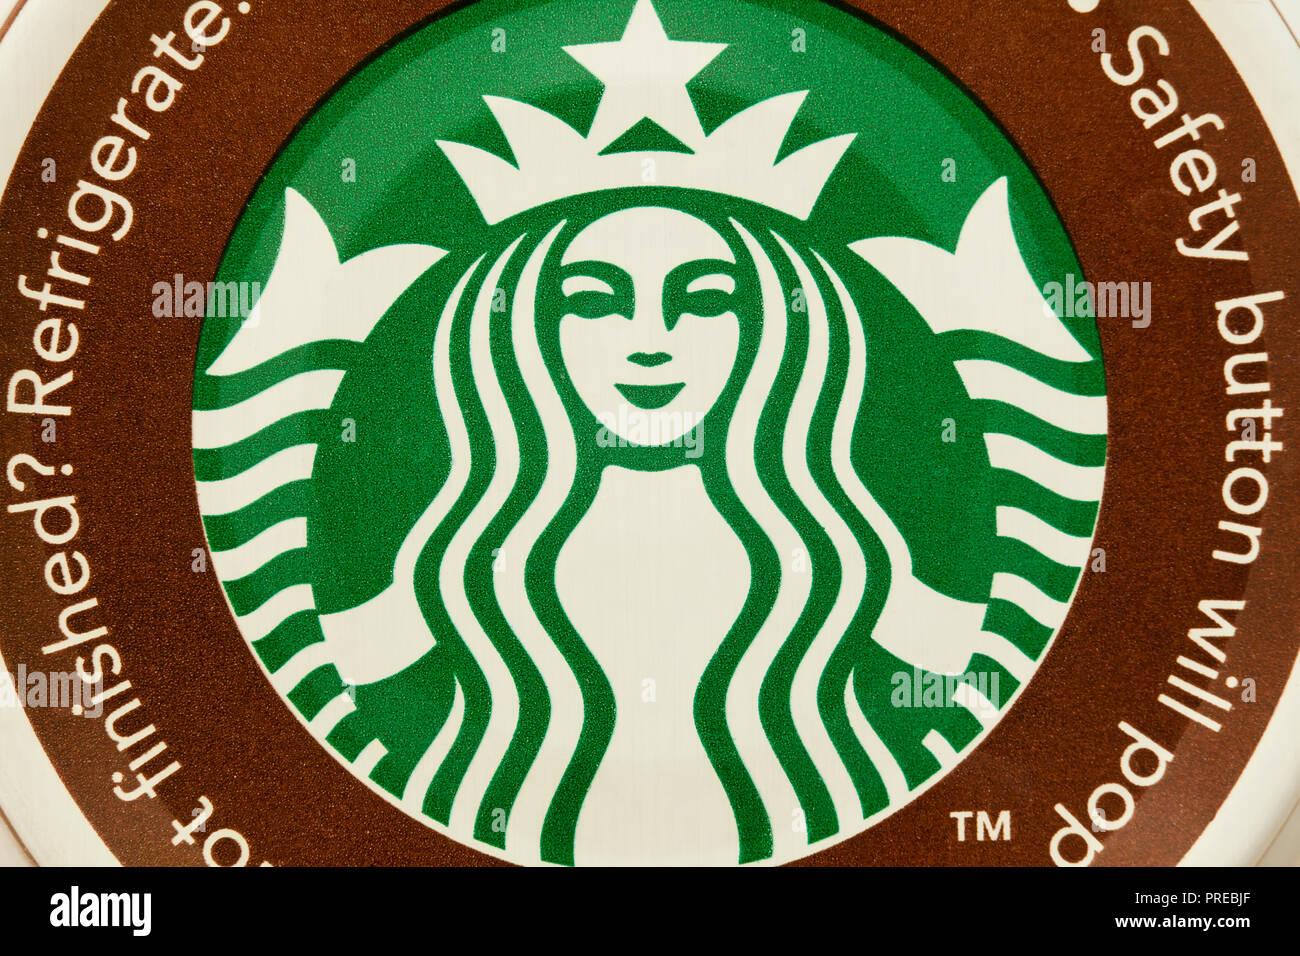 Starbucks logo on bottled coffee lid - USA - Stock Image